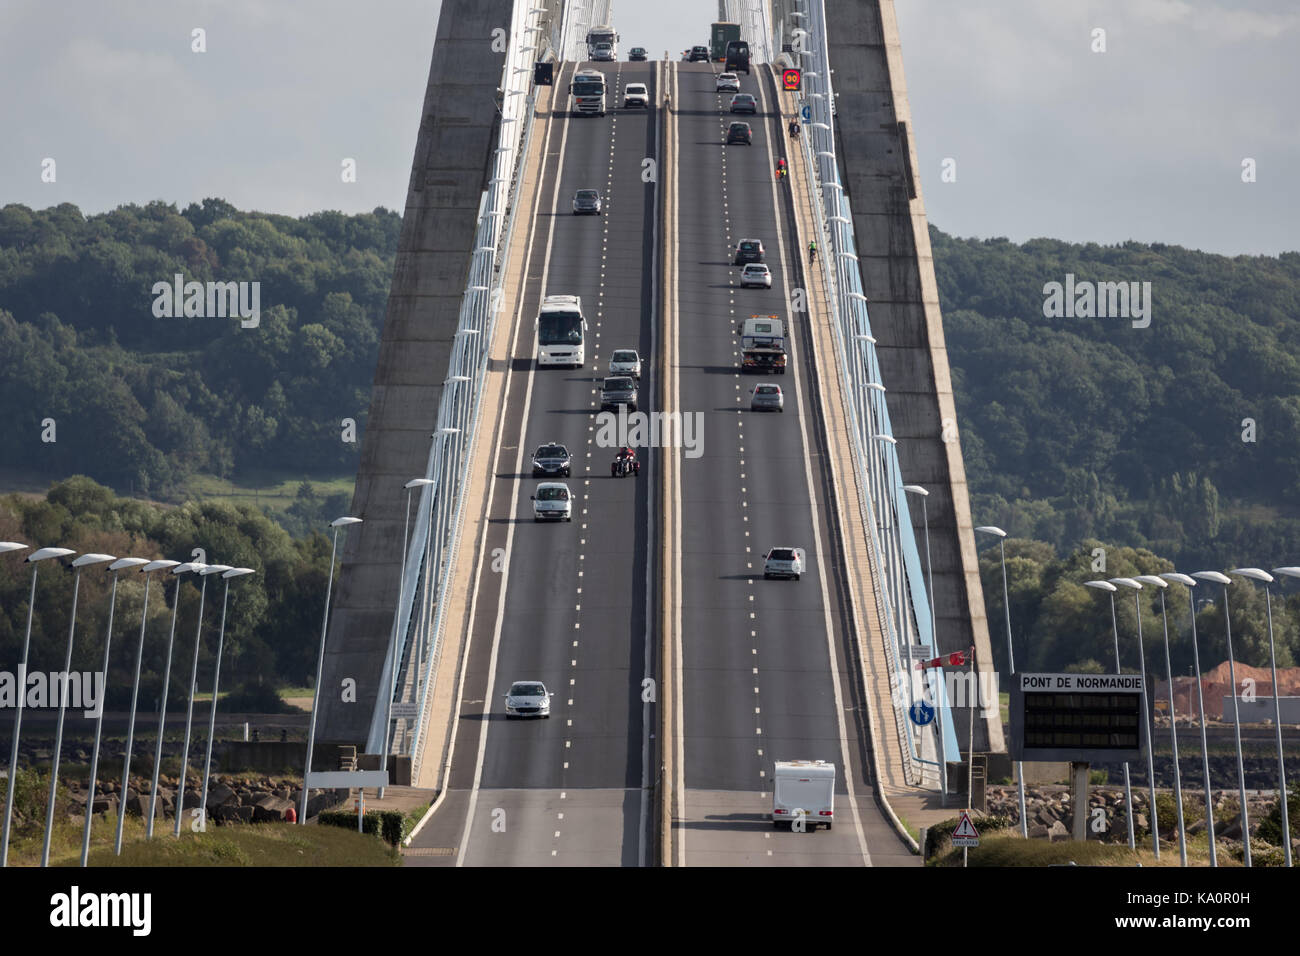 Traffic at Pont de Normandie, bridge over river Seine near Le Havre in France - Stock Image